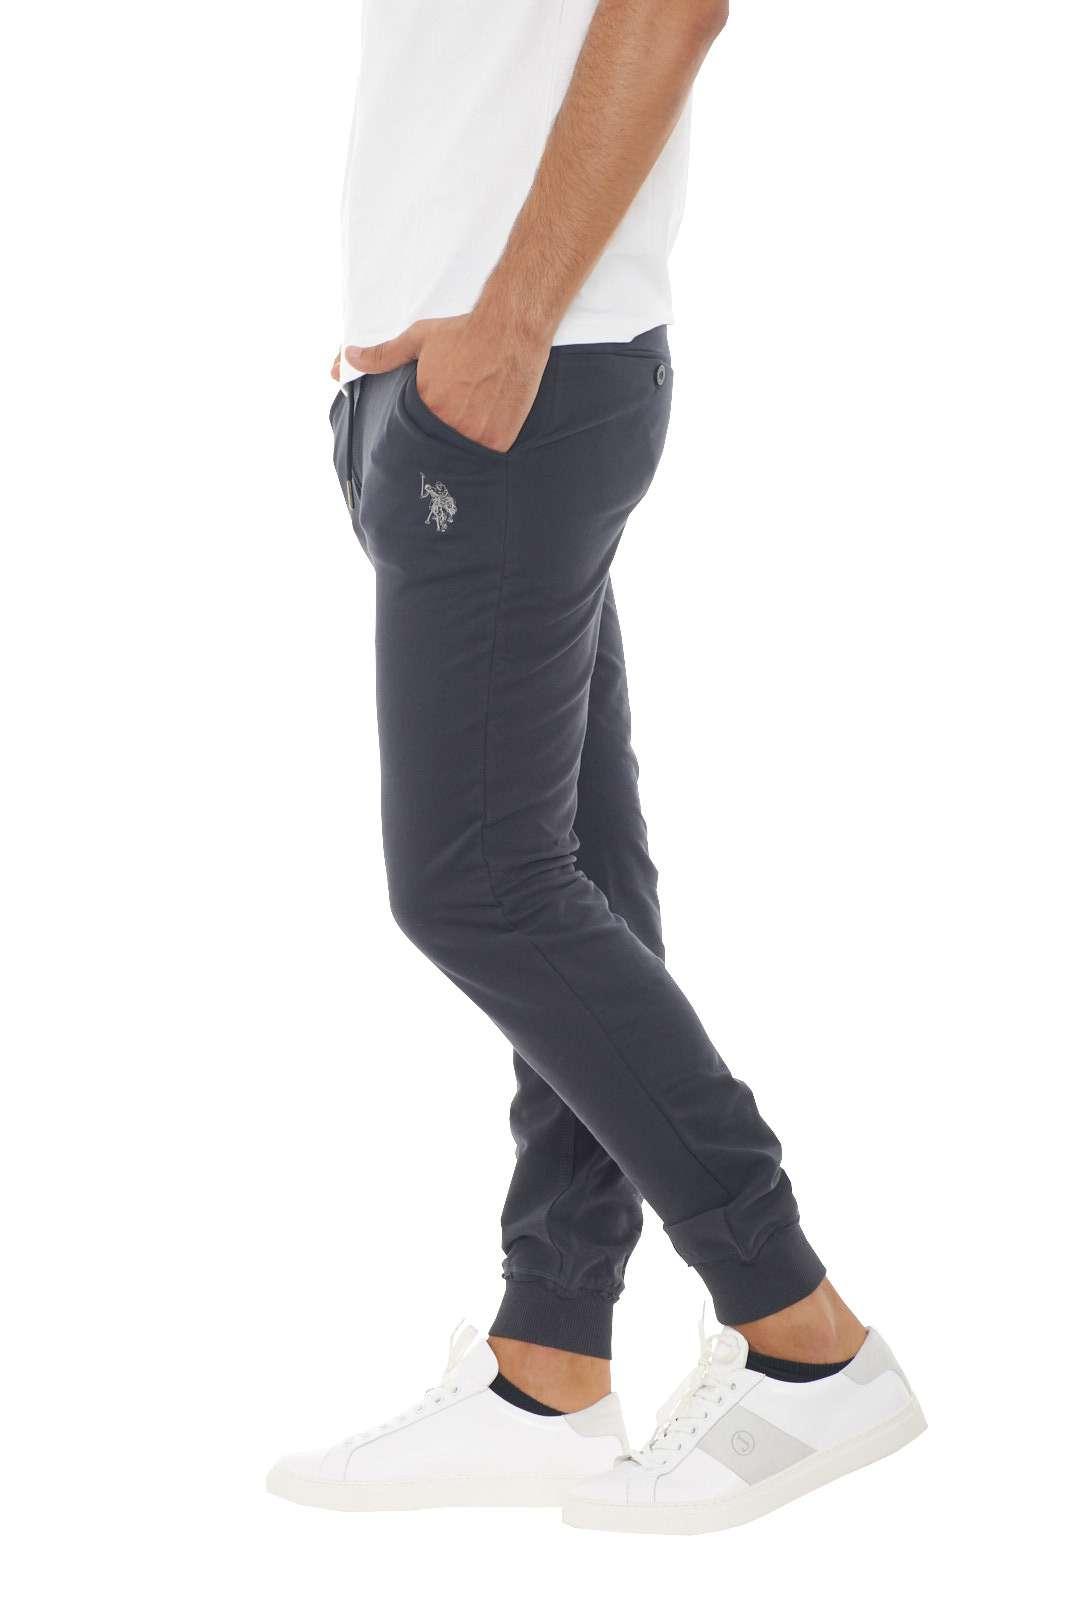 https://www.parmax.com/media/catalog/product/a/i/AI-outlet_parmax-pantaloni-uomo-Us-Polo-43300-B.jpg